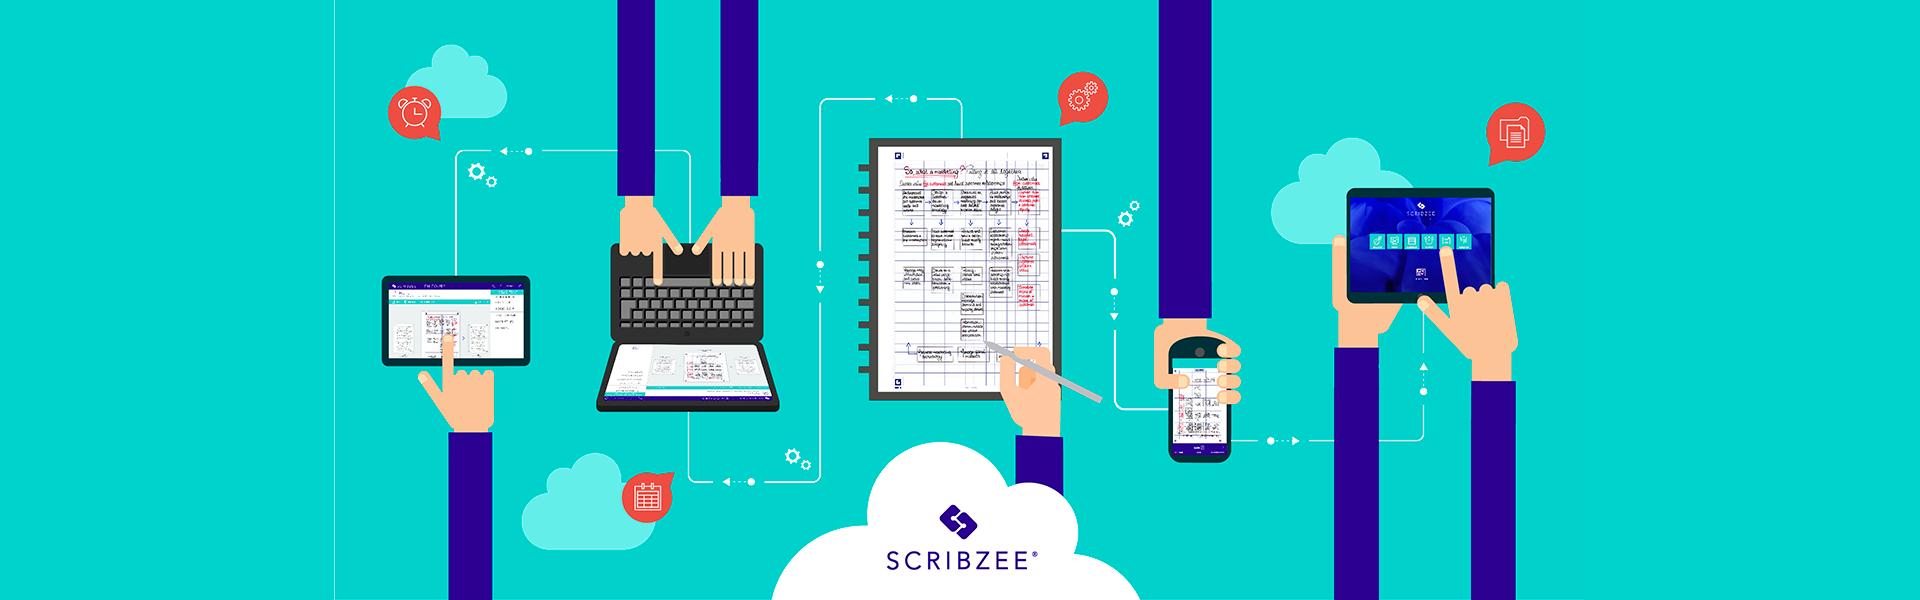 SCRIBZEE_App_Handwritten_notes_management_scan_save_access_share